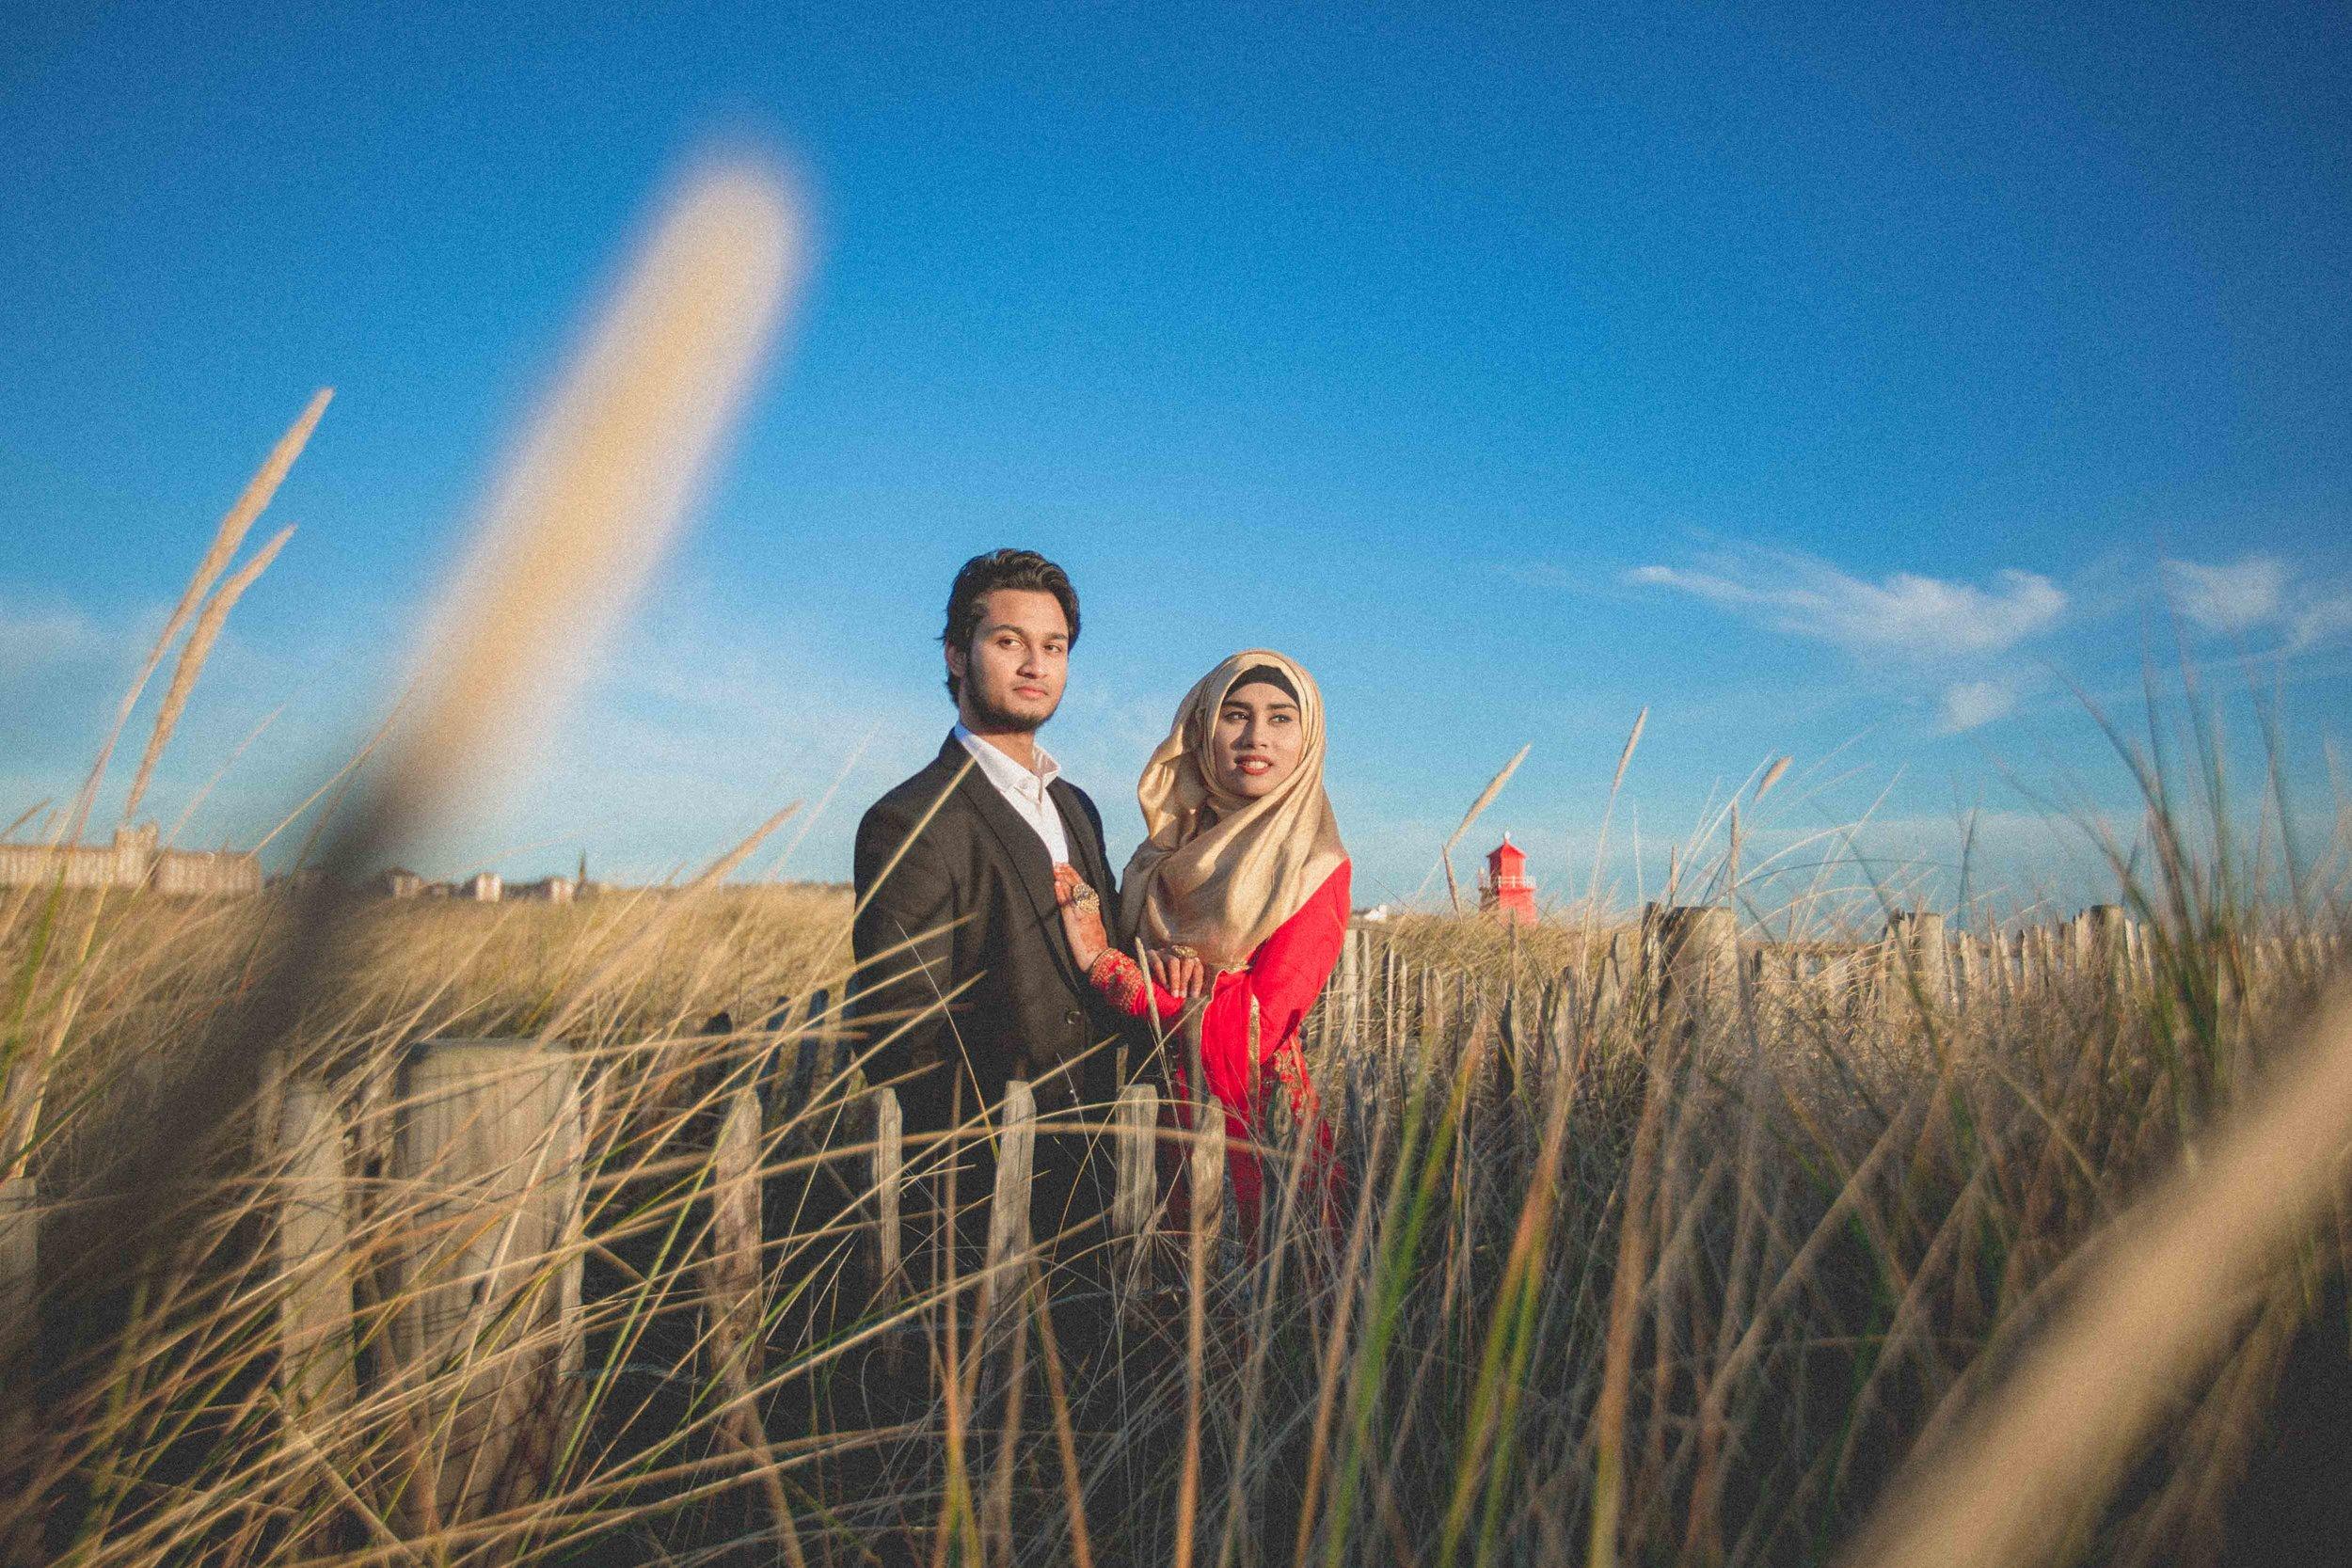 newcastle-beach-lighthouse-couple-prewedding-pre-wedding-shoot-asian-wedding-photographer-natalia-smith-photography-5.jpg